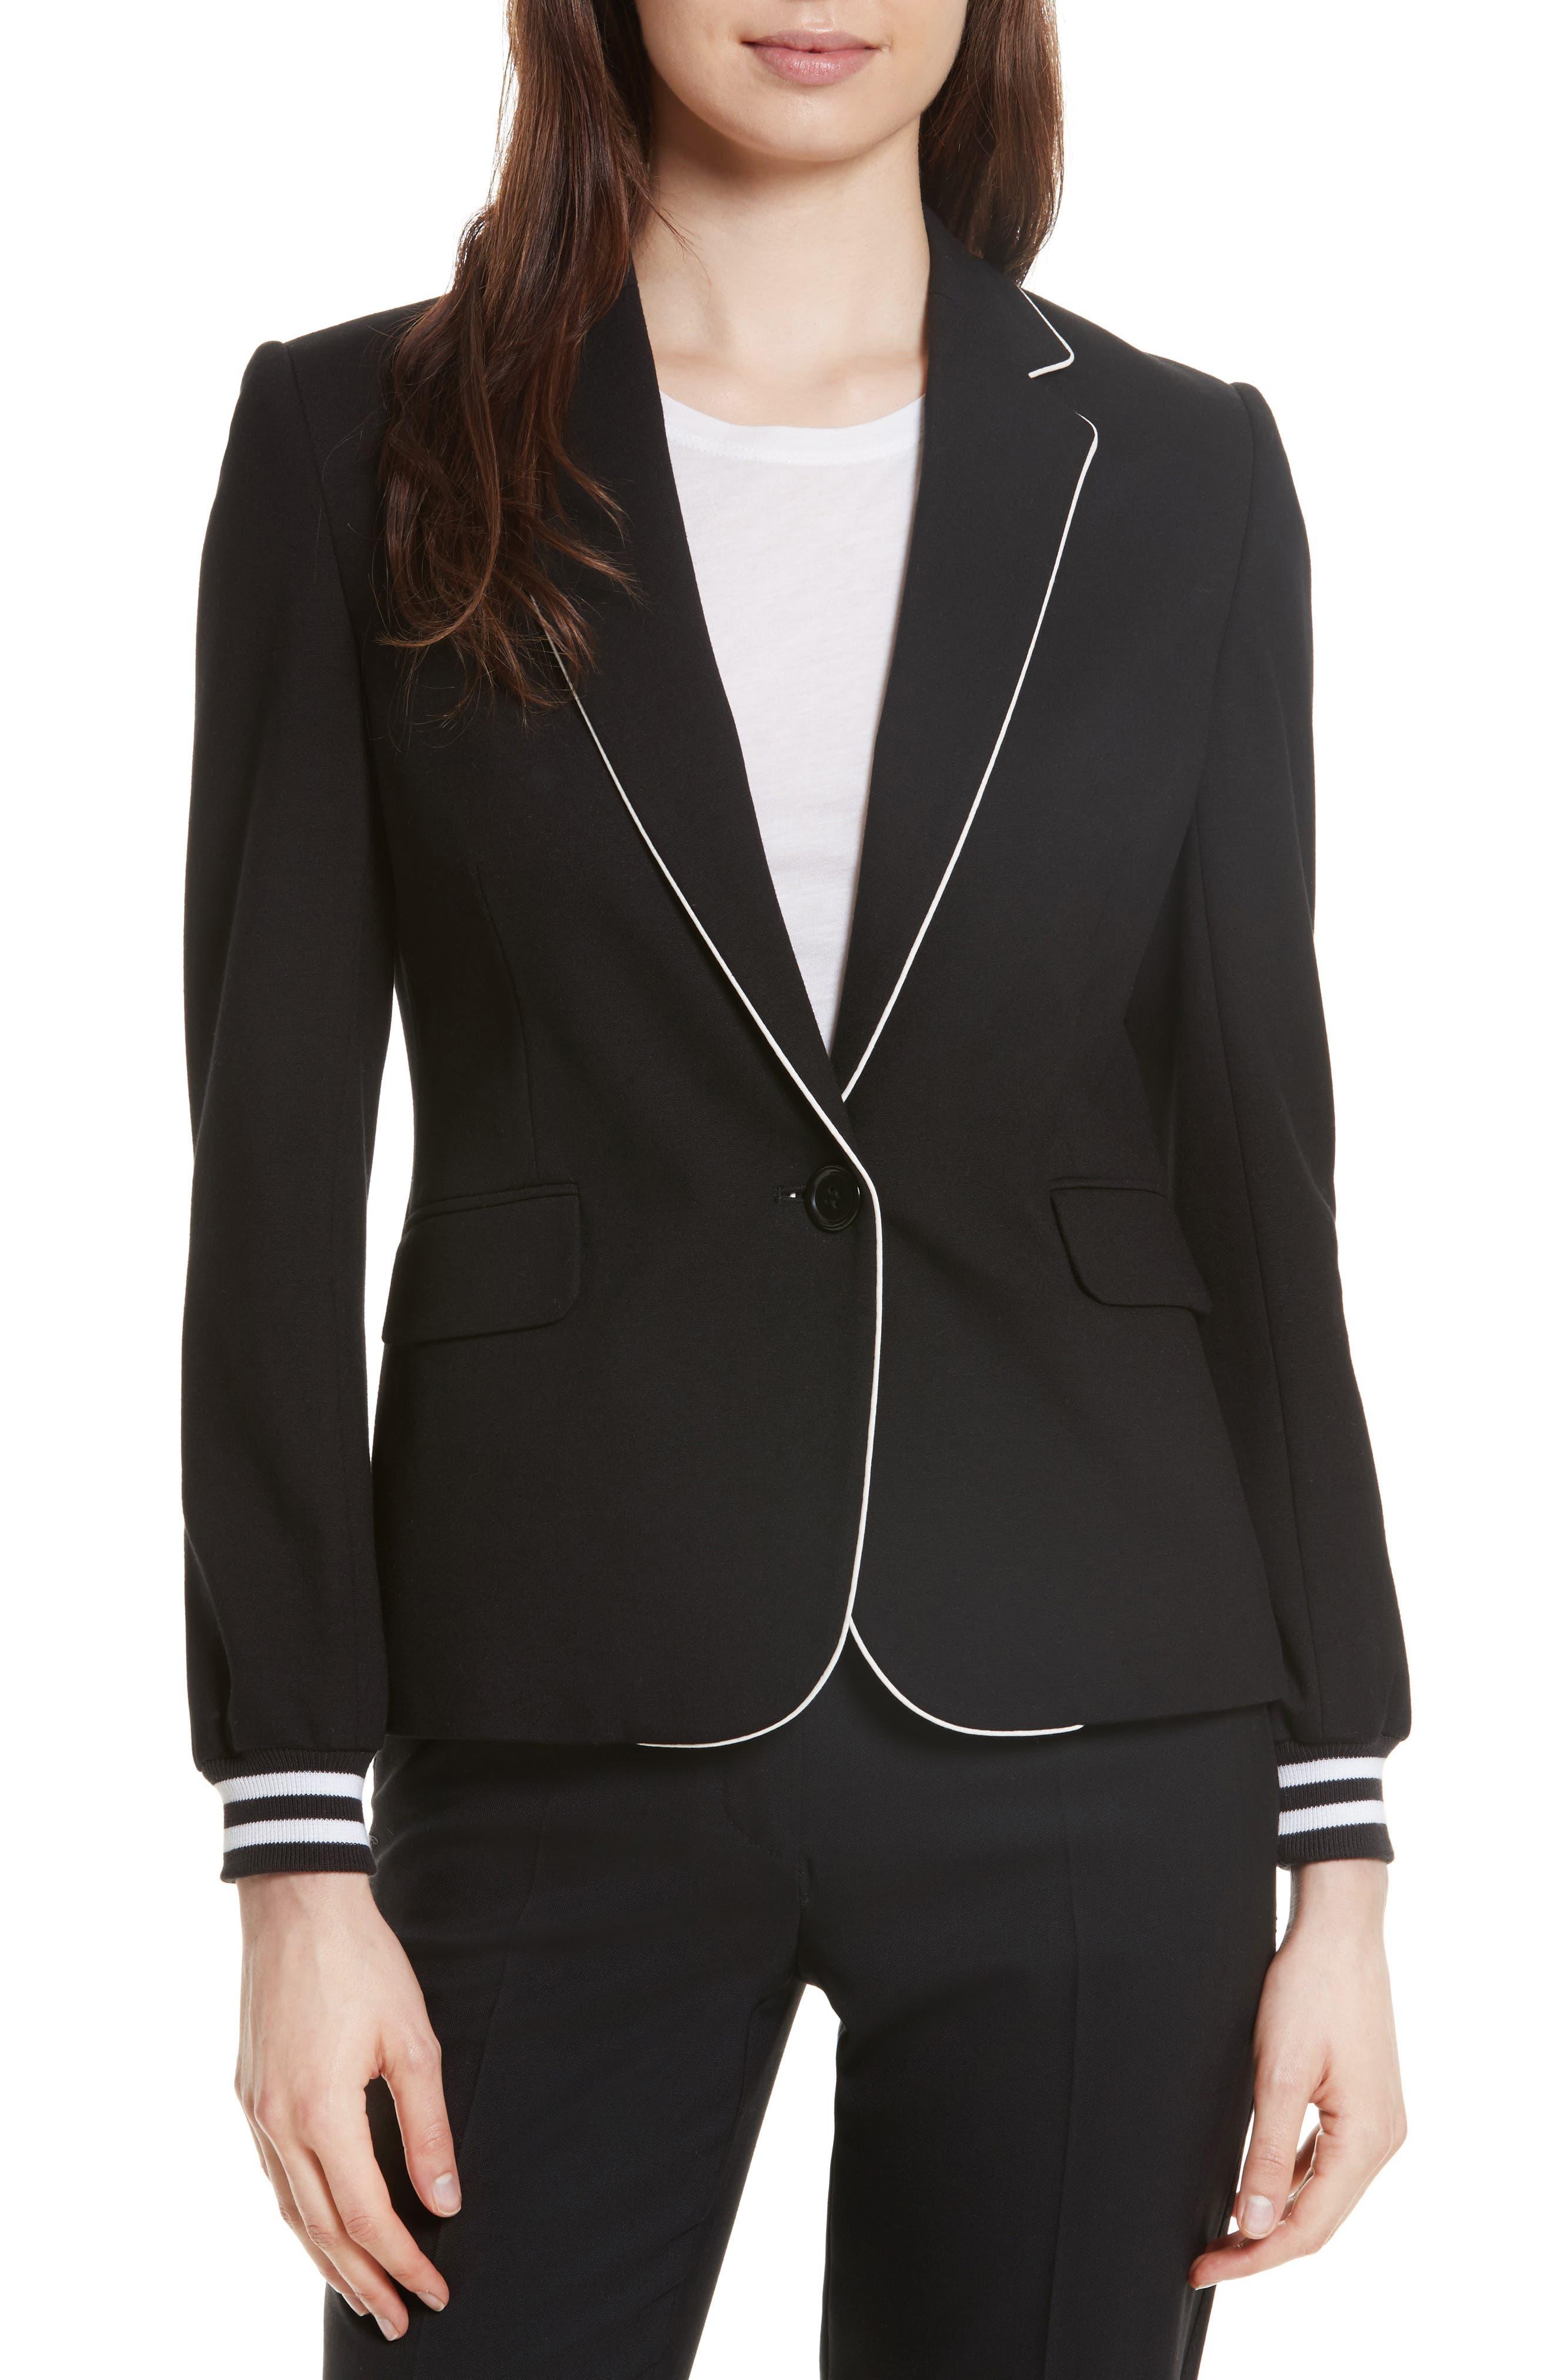 Piped Jersey Blazer,                             Main thumbnail 1, color,                             Black/ White